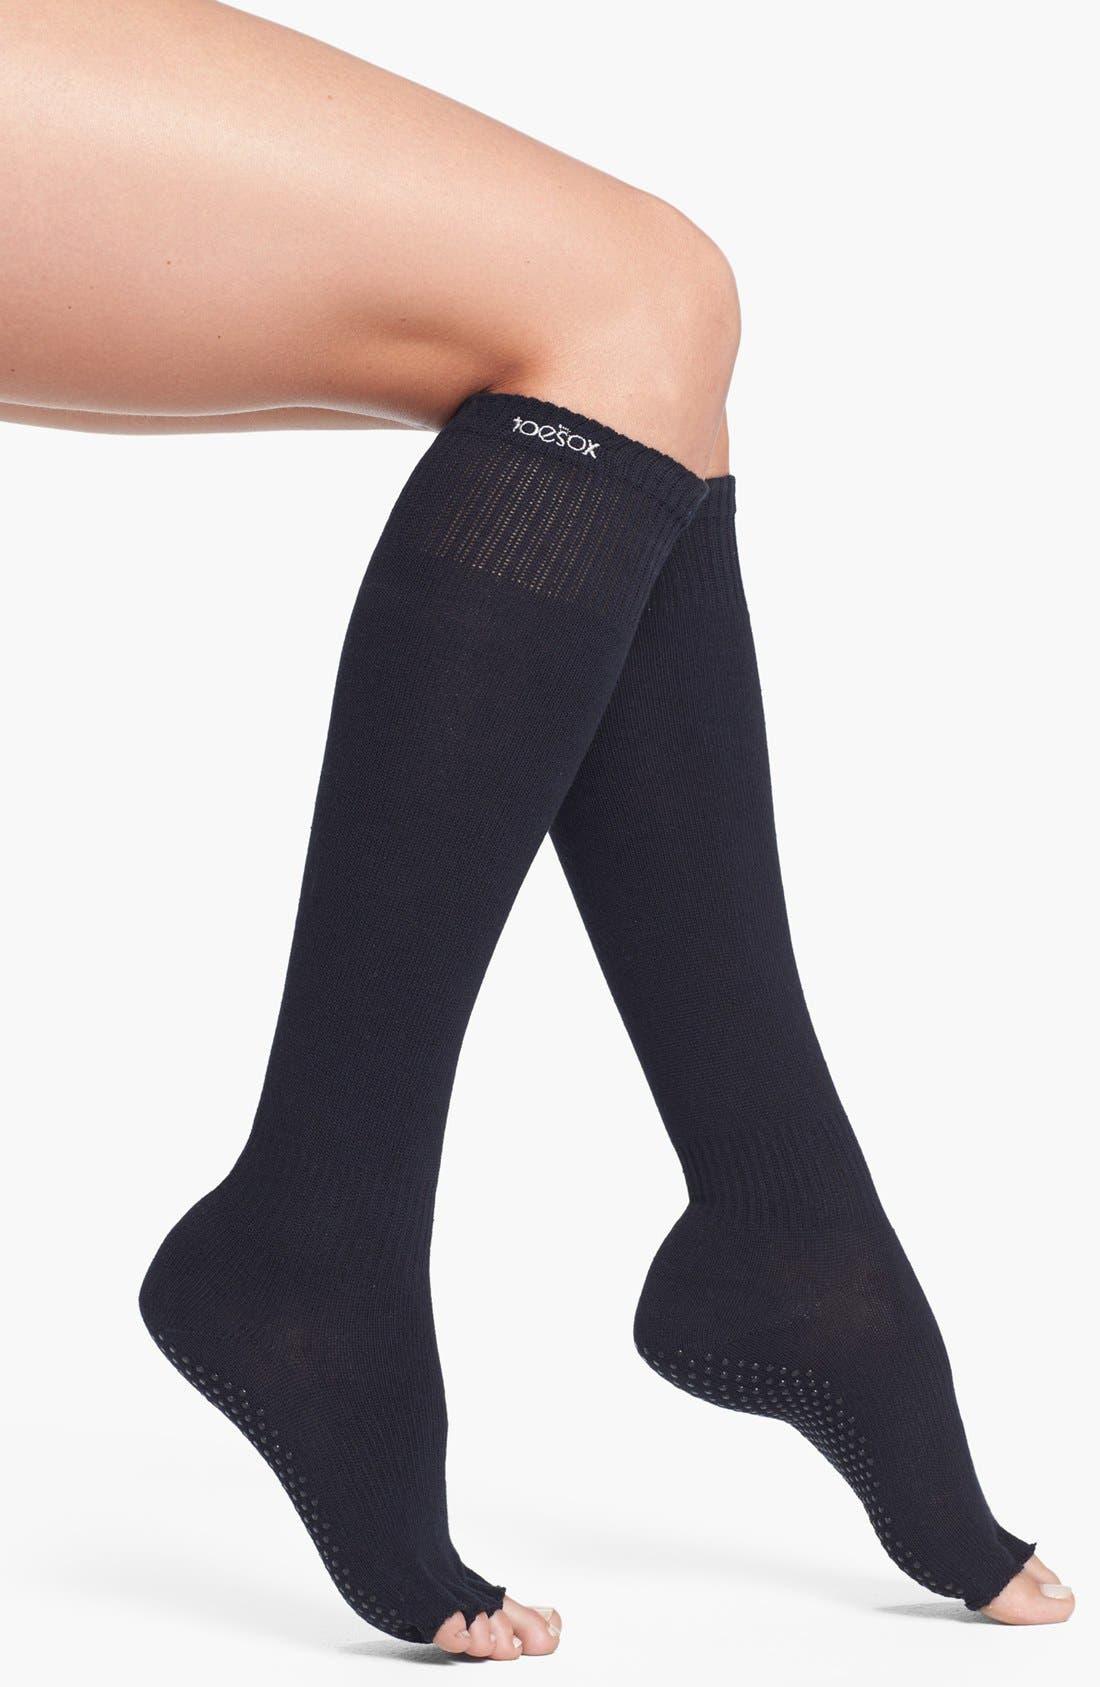 Alternate Image 1 Selected - ToeSox Scrunch Knee High Half Toe Socks